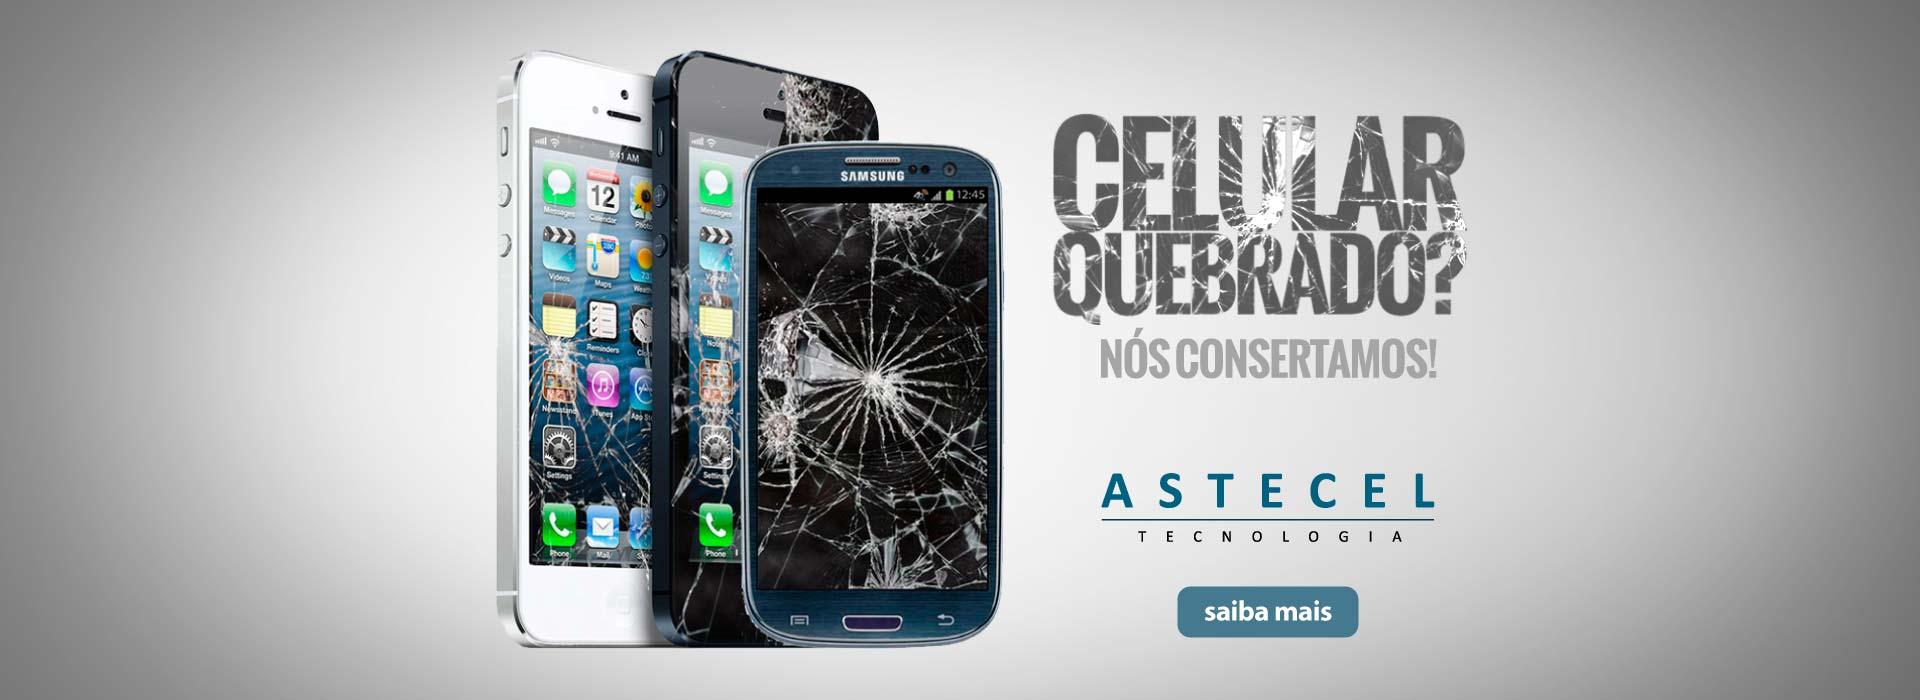 astecel-tecnologia-jrc